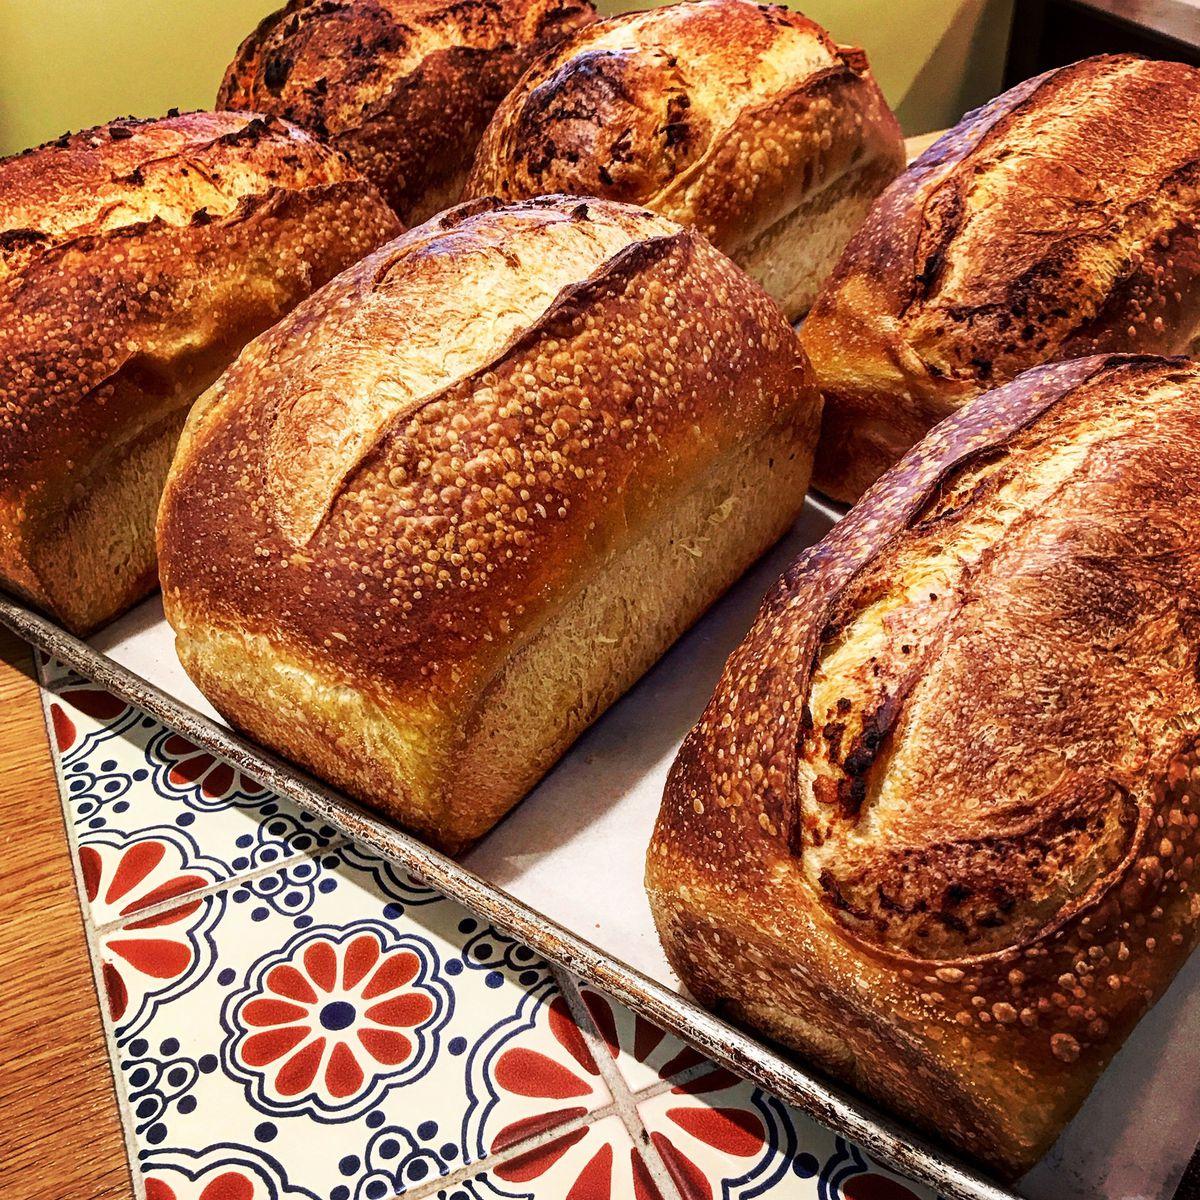 Six freshly baked sweet potato breads on a silver tray at La Calavera